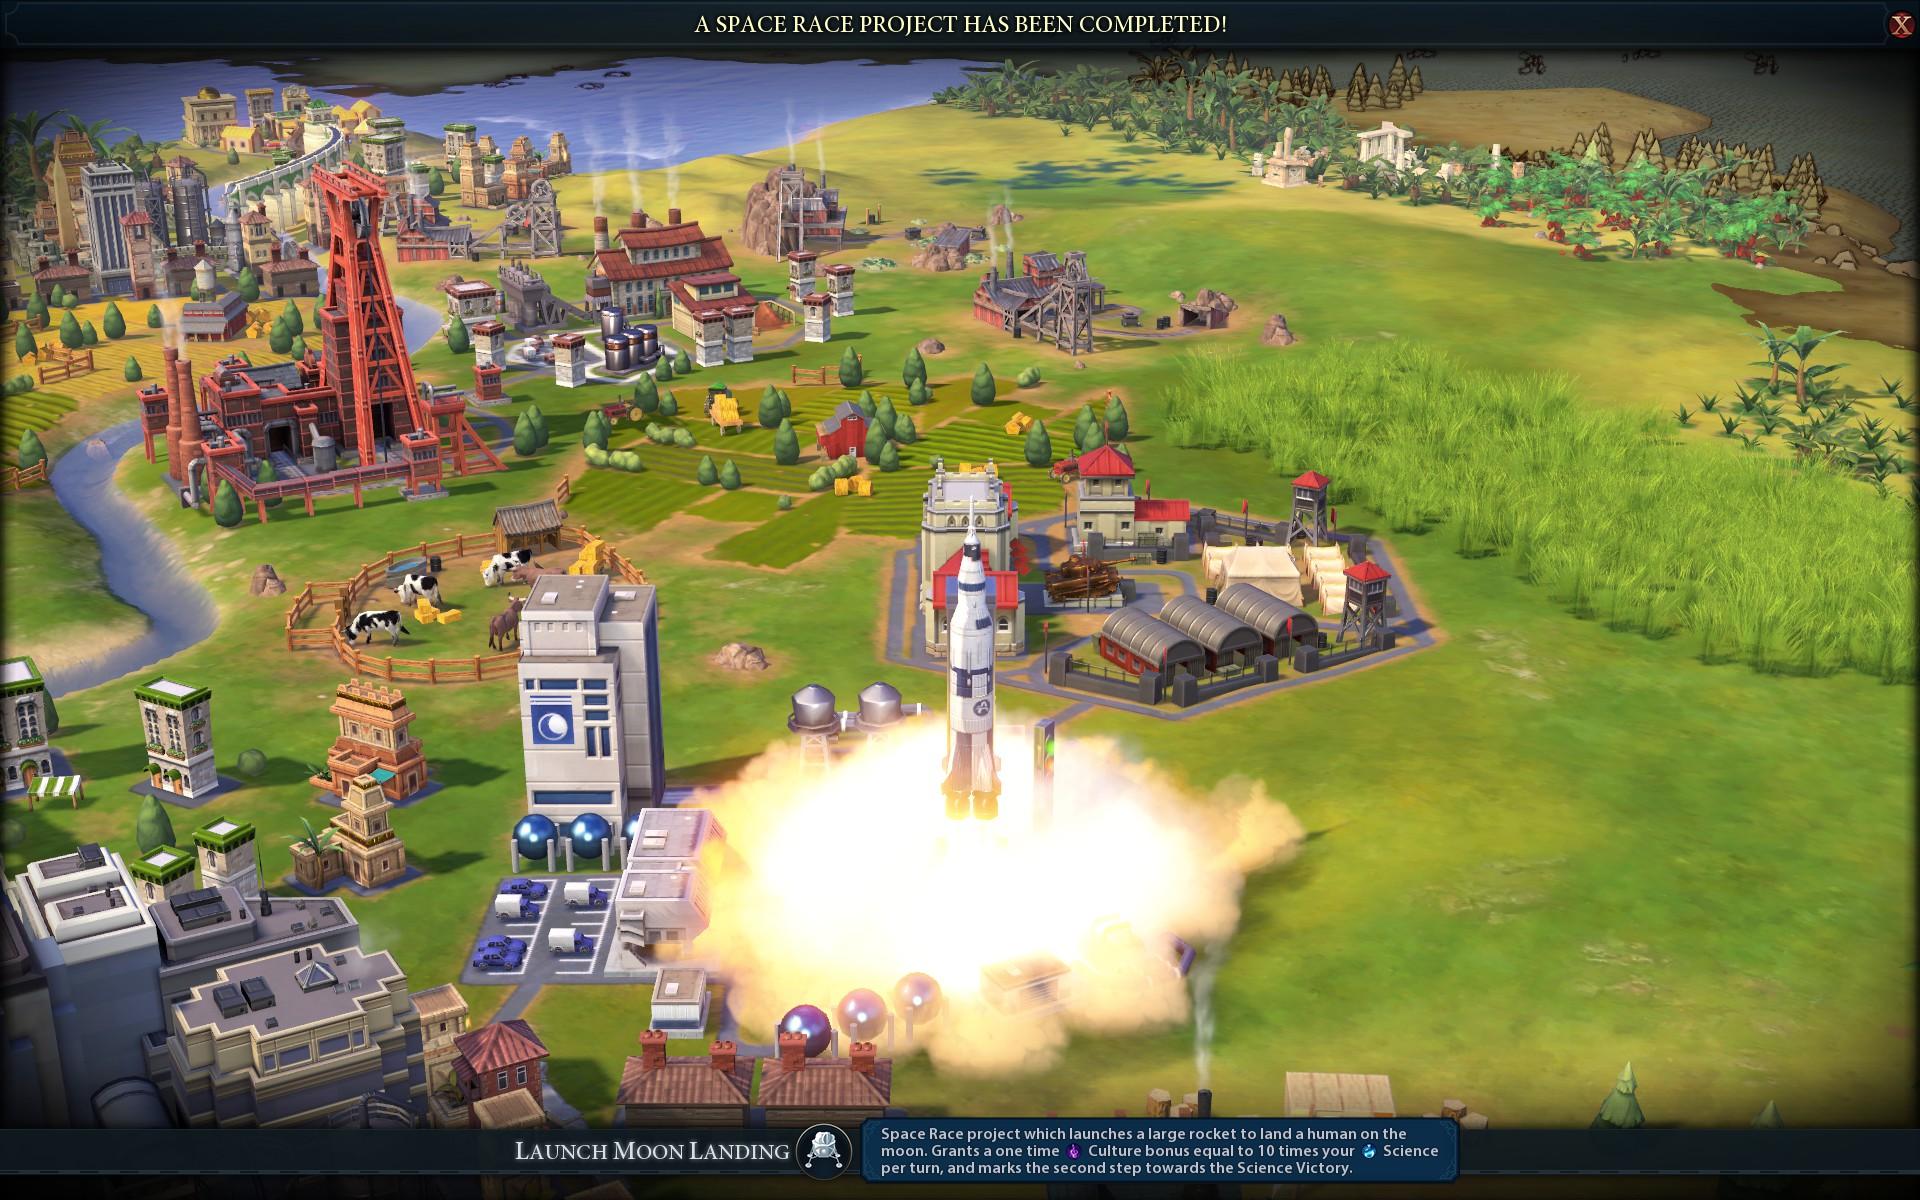 Launch Moon Landing (Civ6) | Civilization Wiki | FANDOM powered by Wikia